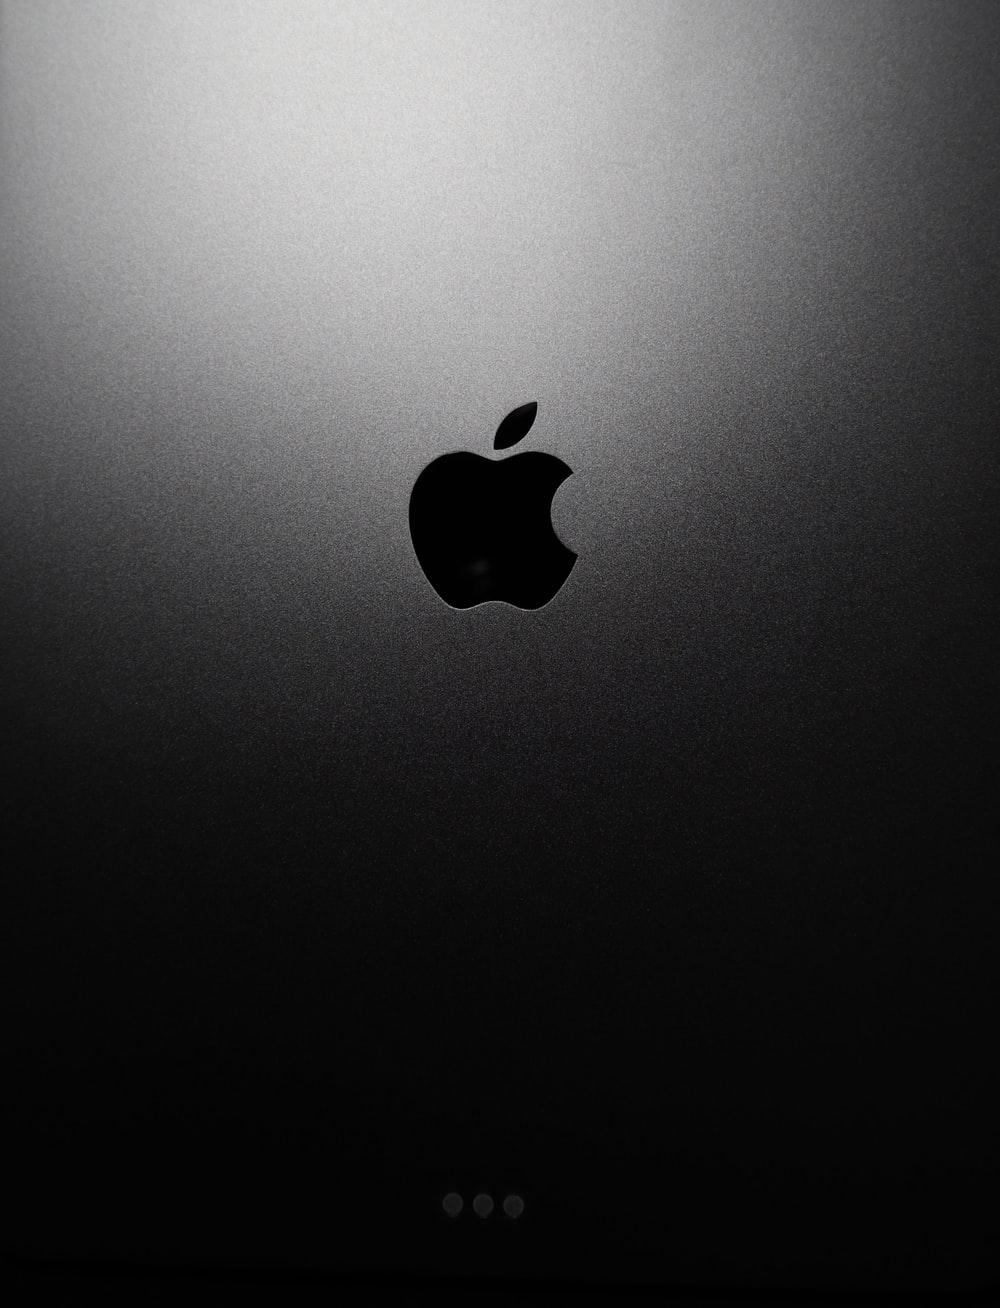 500 Apple Logo Pictures [HD] Download Images on Unsplash 1000x1308